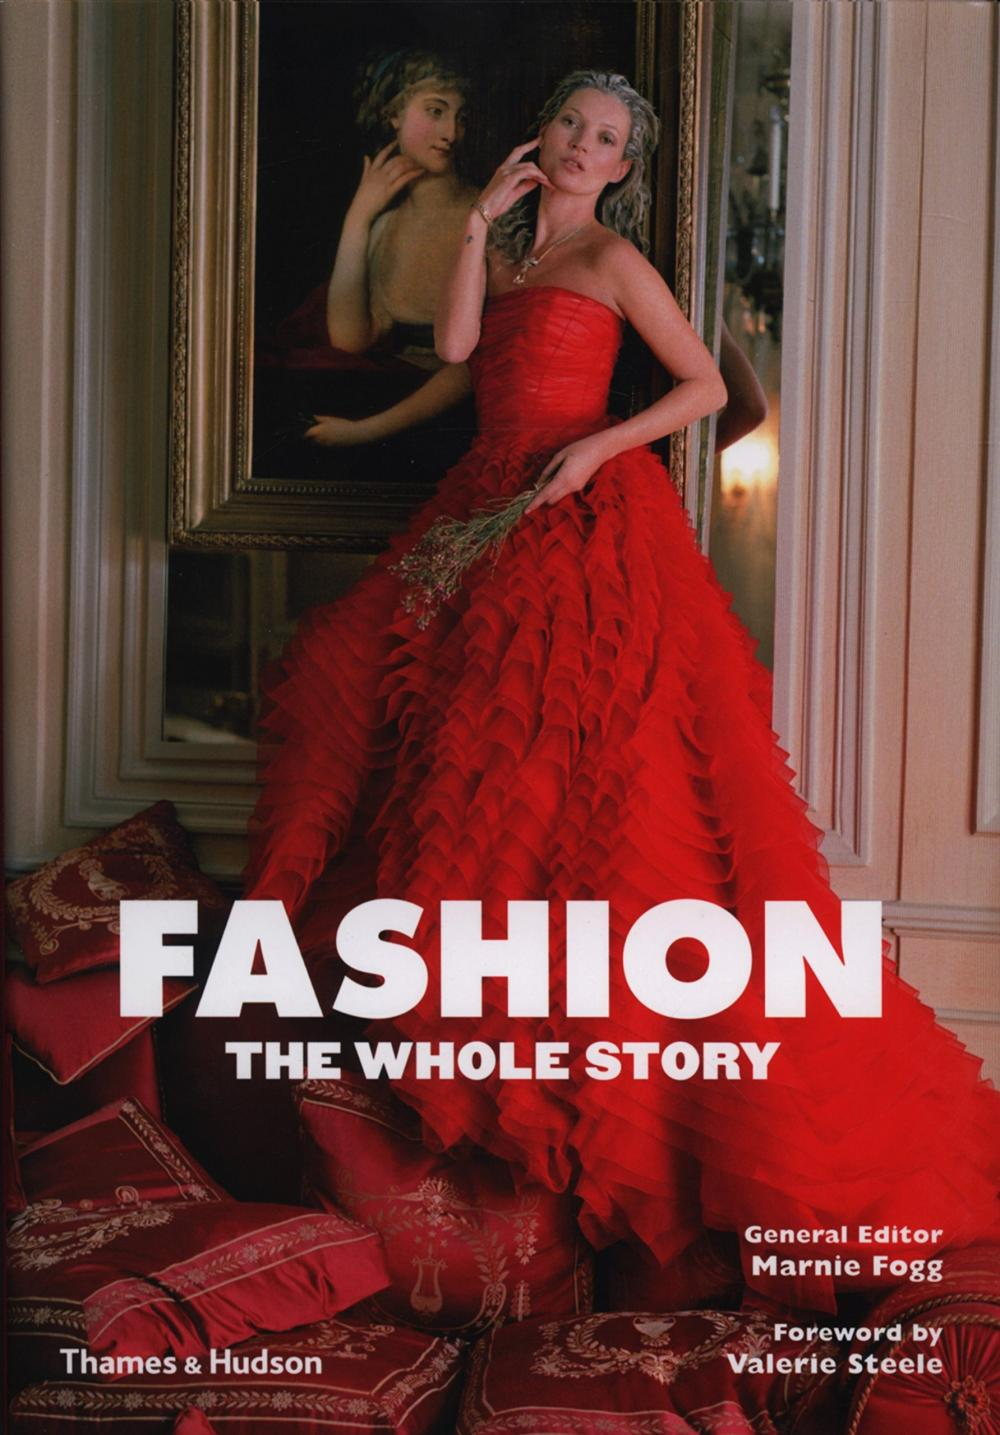 FASHION. THE WHOLE STORY